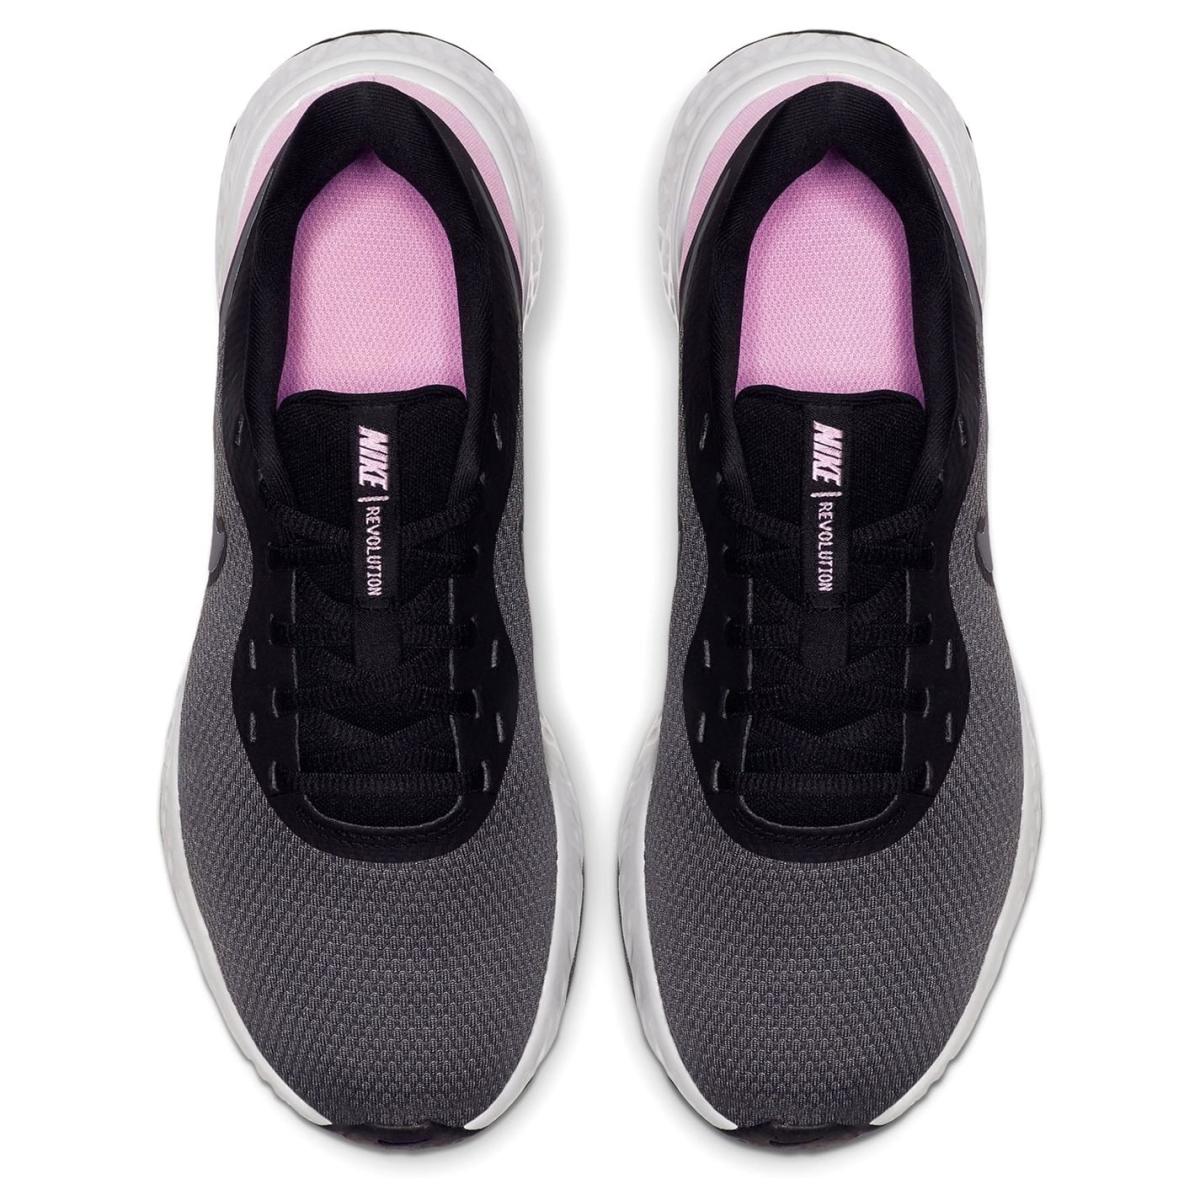 Nike-Revolution-Turnschuhe-Damen-Sneaker-Sportschuhe-Laufschuhe-1160 Indexbild 14